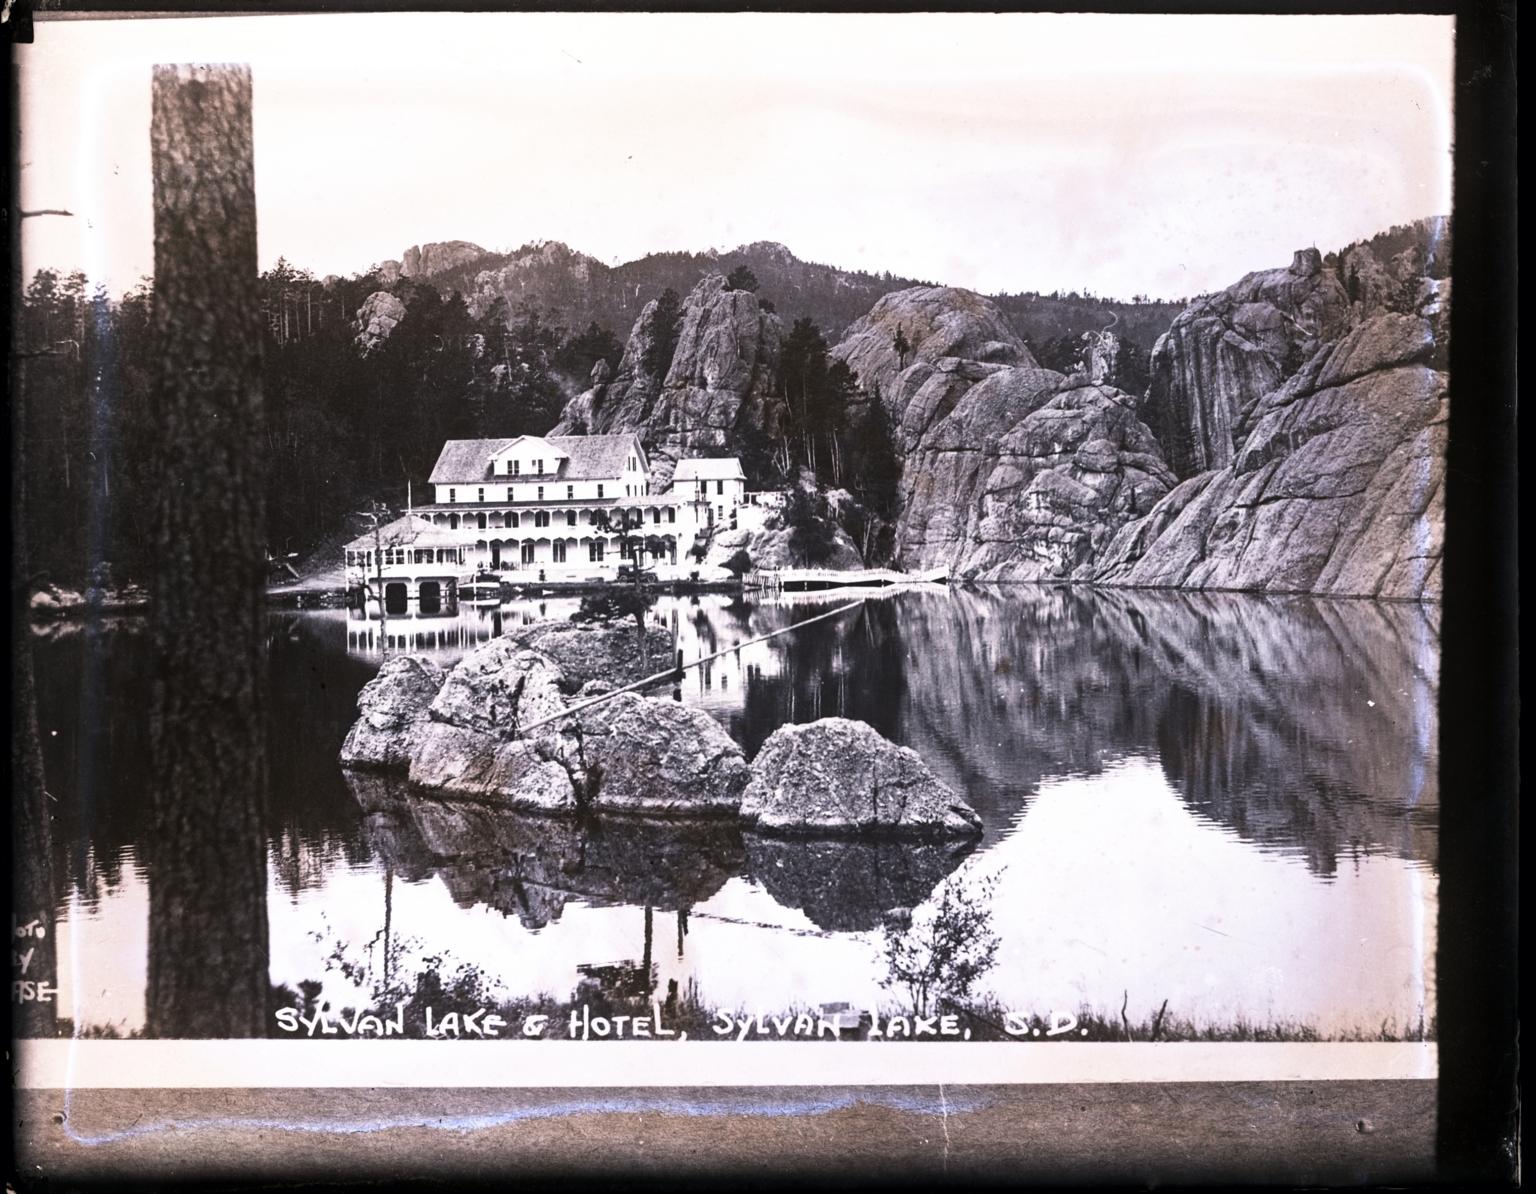 Black Hills National Forest Sylvan Lake and Hotel